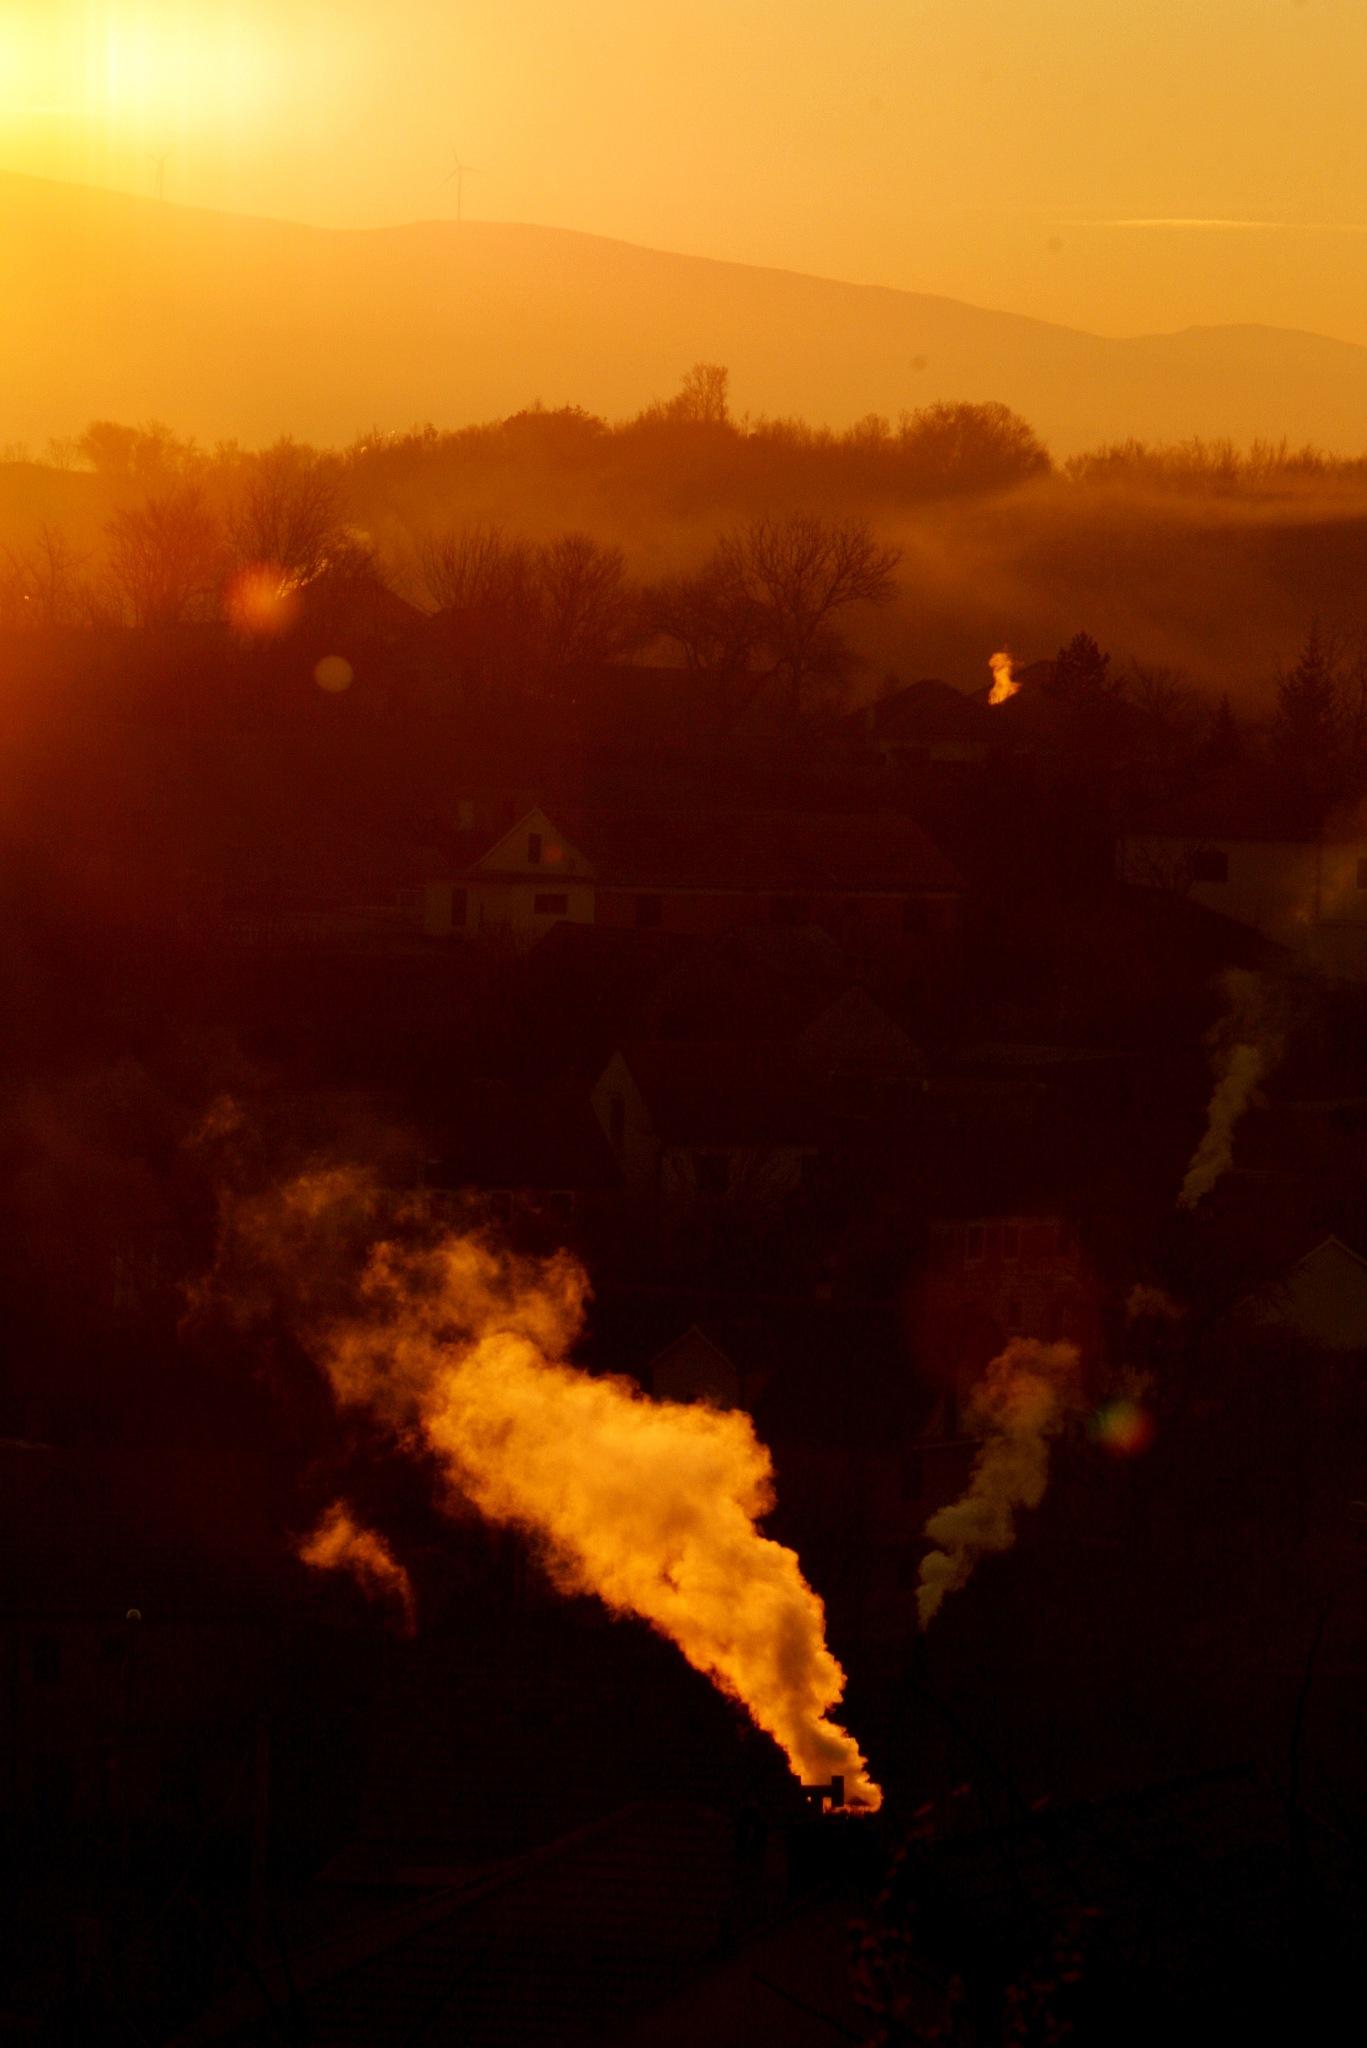 morning chimneys by ivana_poljak